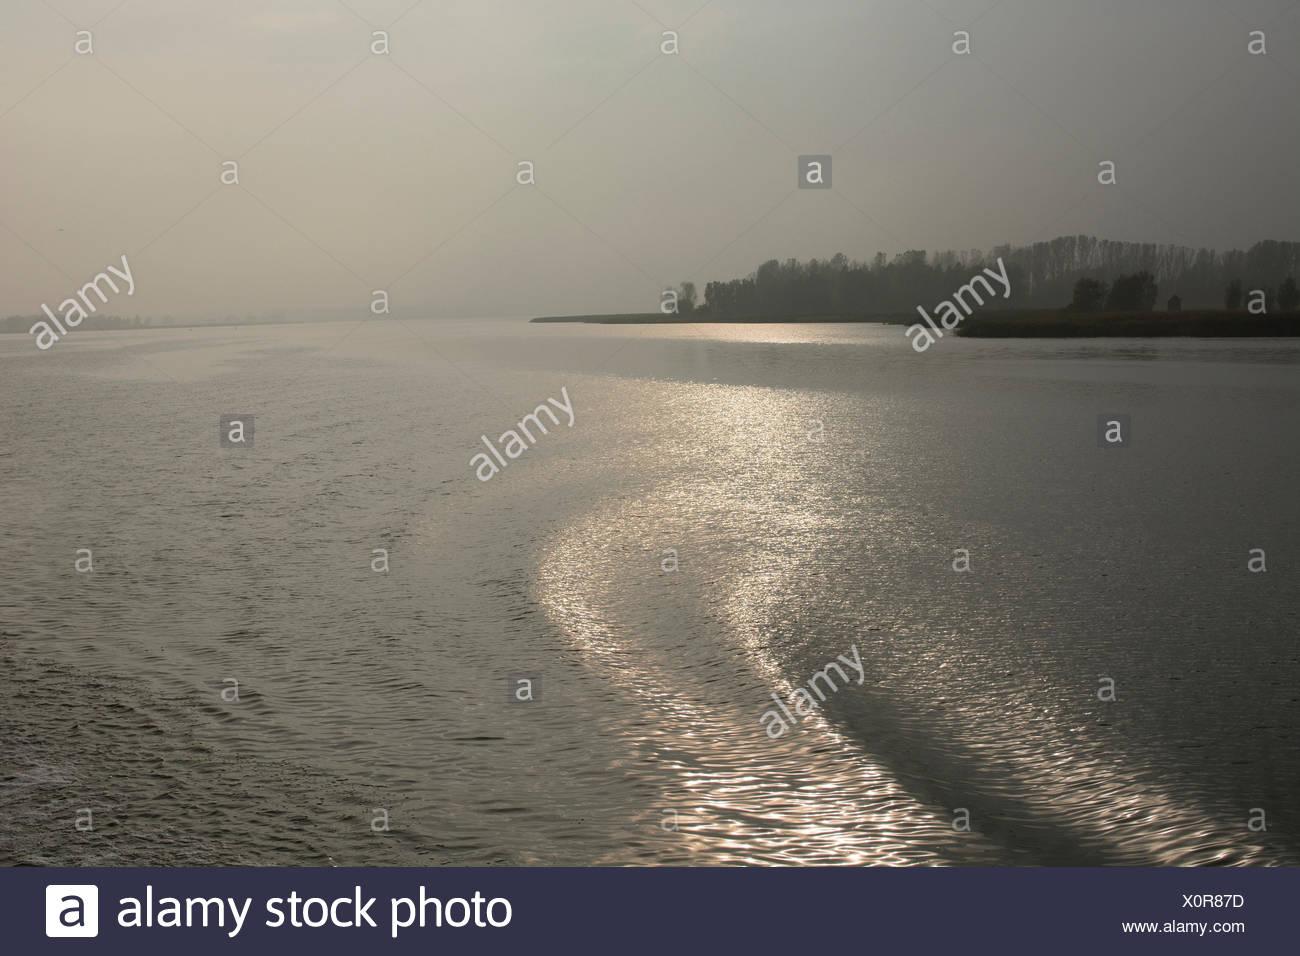 Lagoon of Stettin, water, waves, gleam of light, Wolgast, Mecklenburg-Vorpommern, Germany Stock Photo